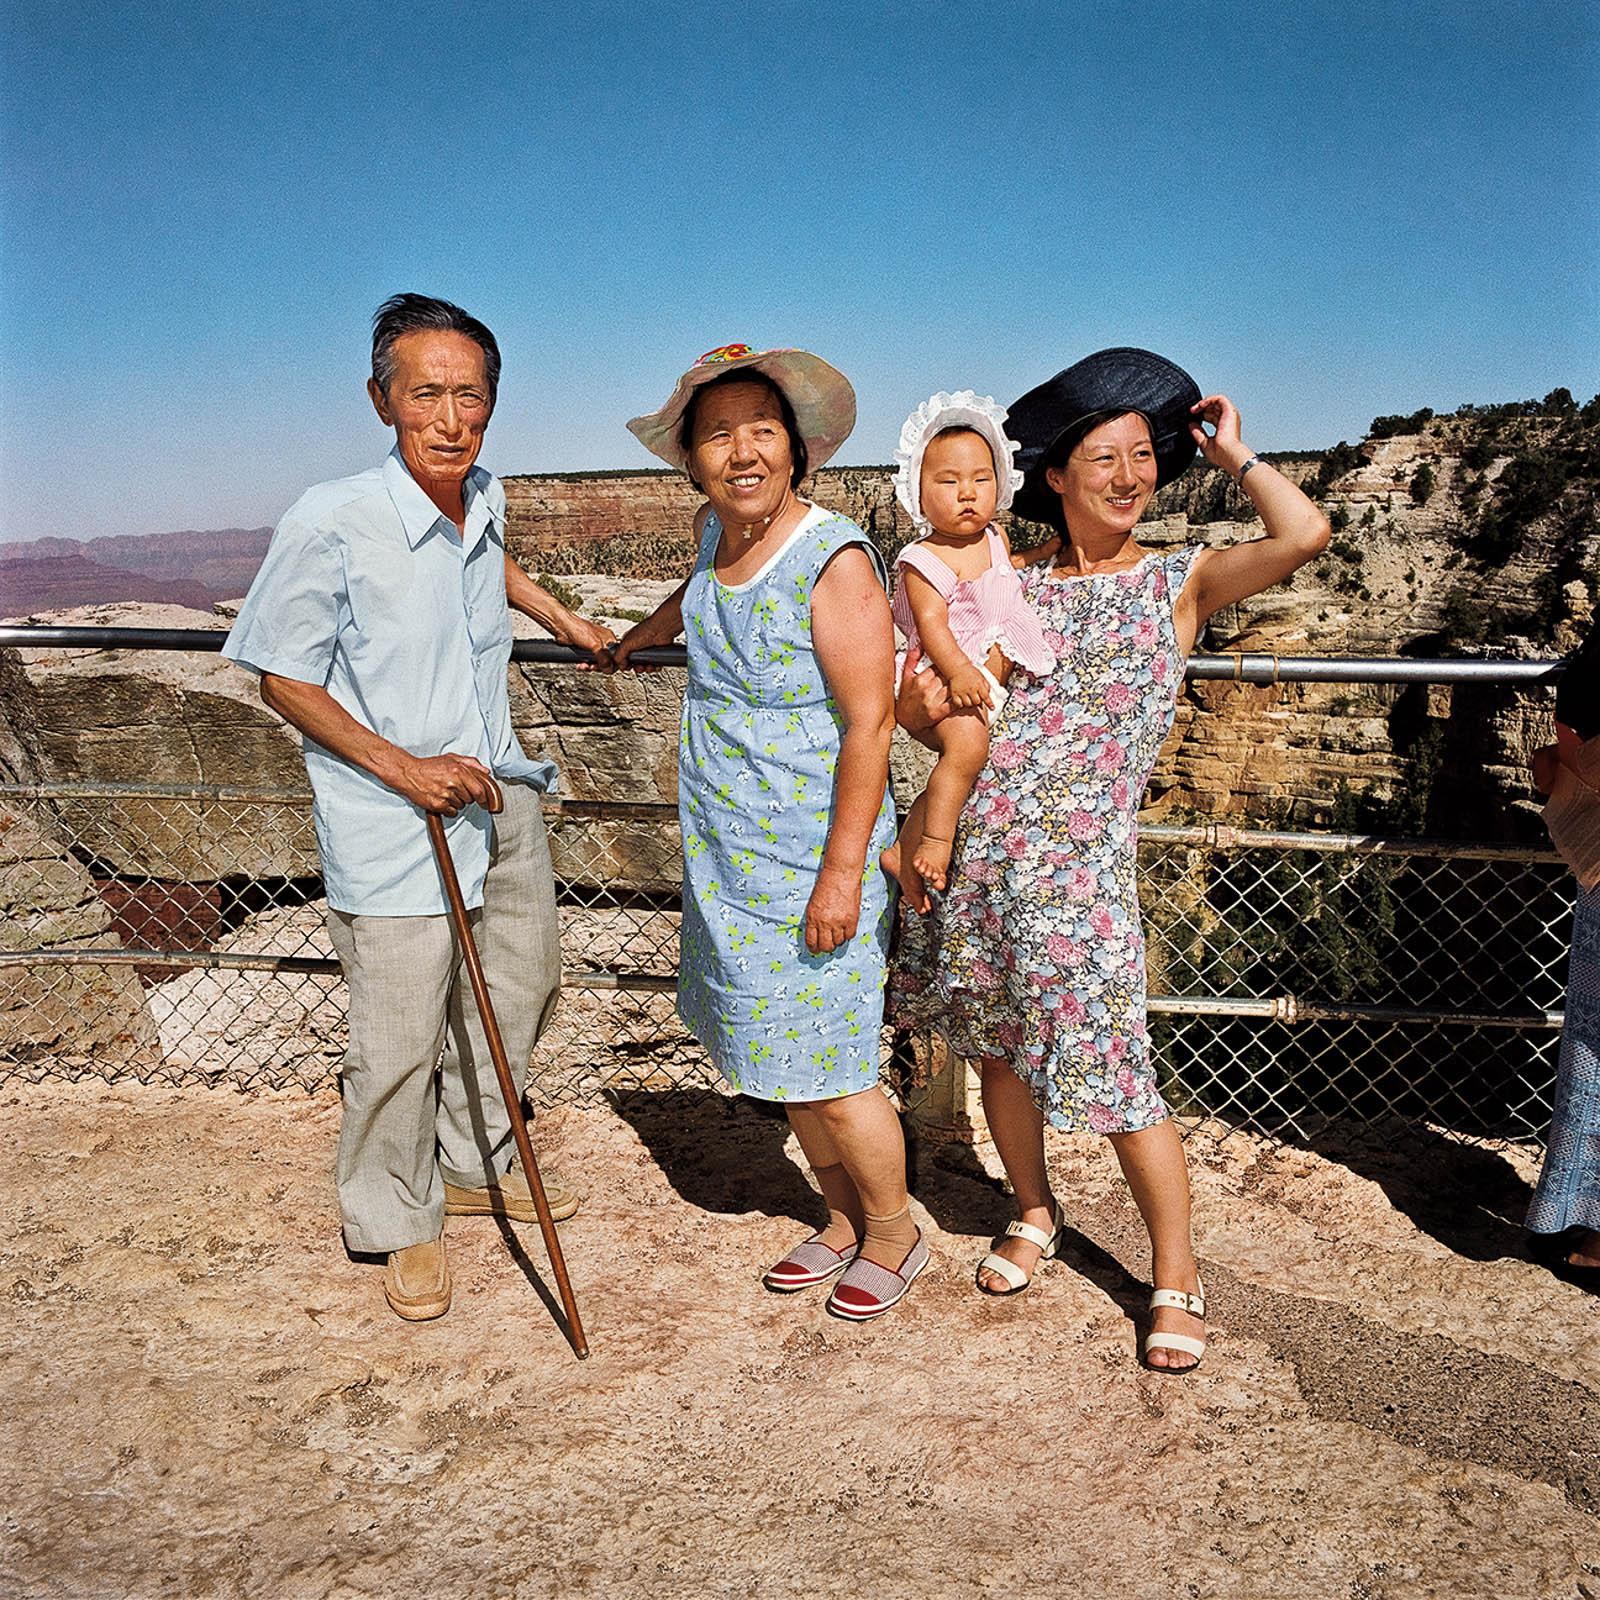 Family at Grand Canyon National Park, Arizona 1980